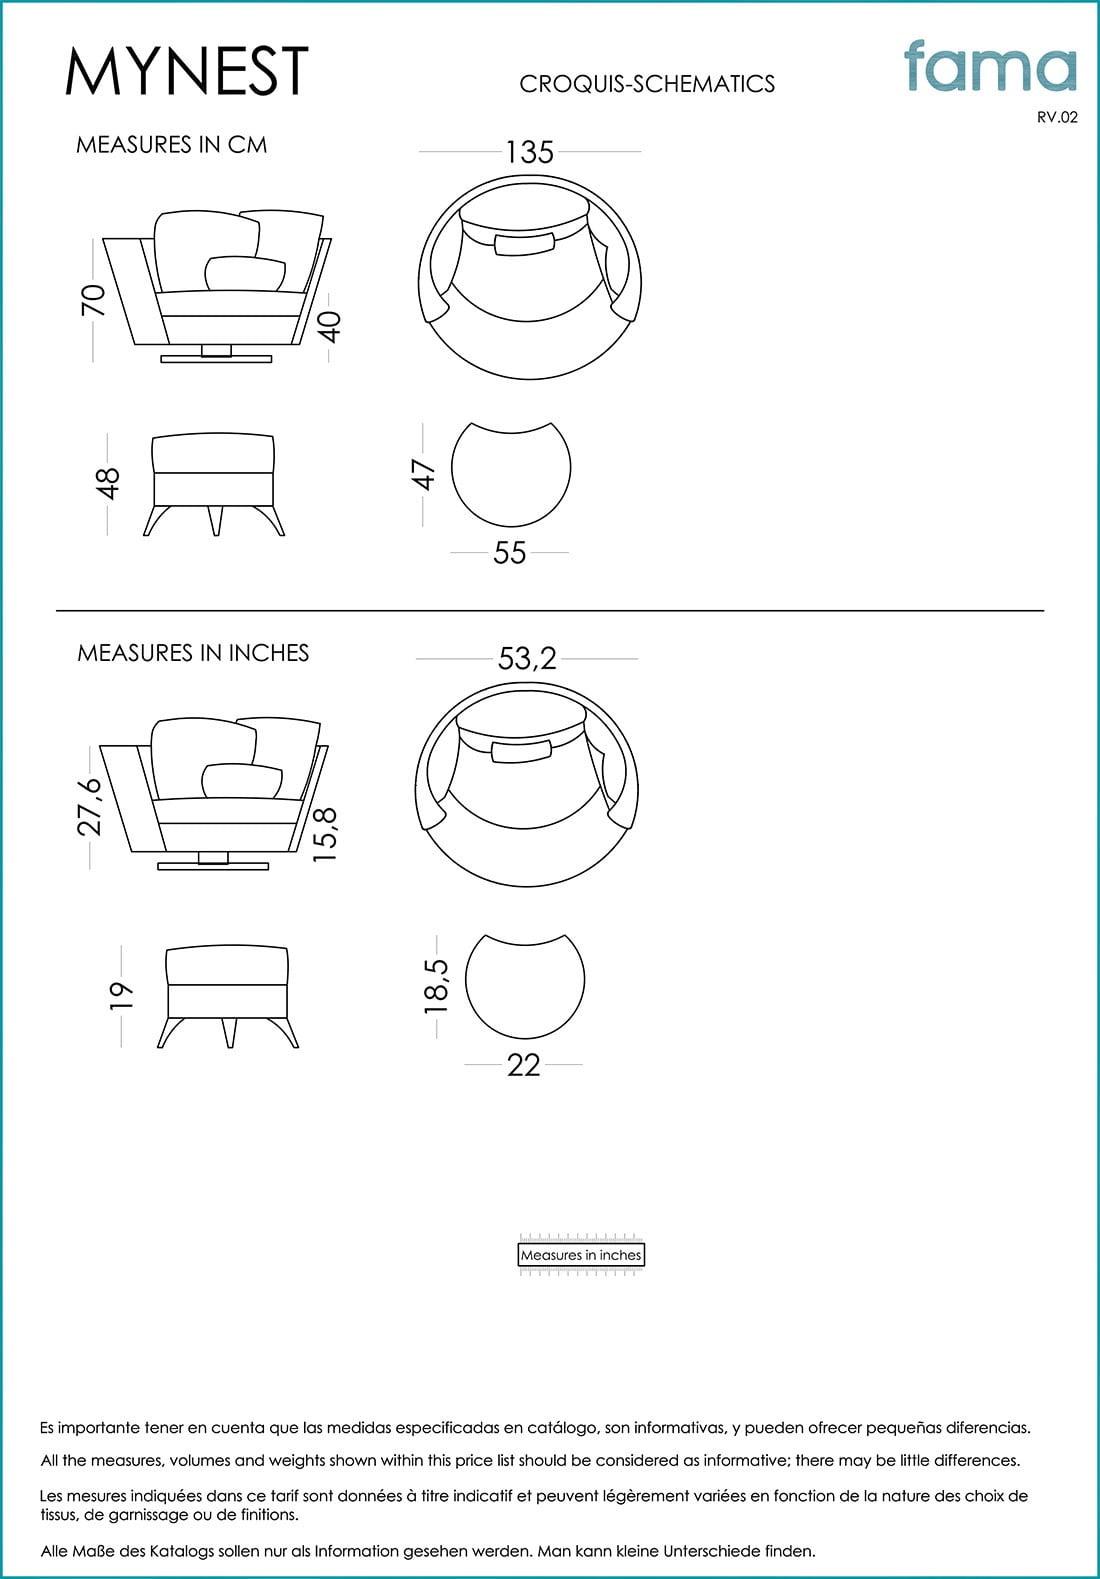 fauteuil_moderne_famaliving_montreal_mynest_fiche_technique